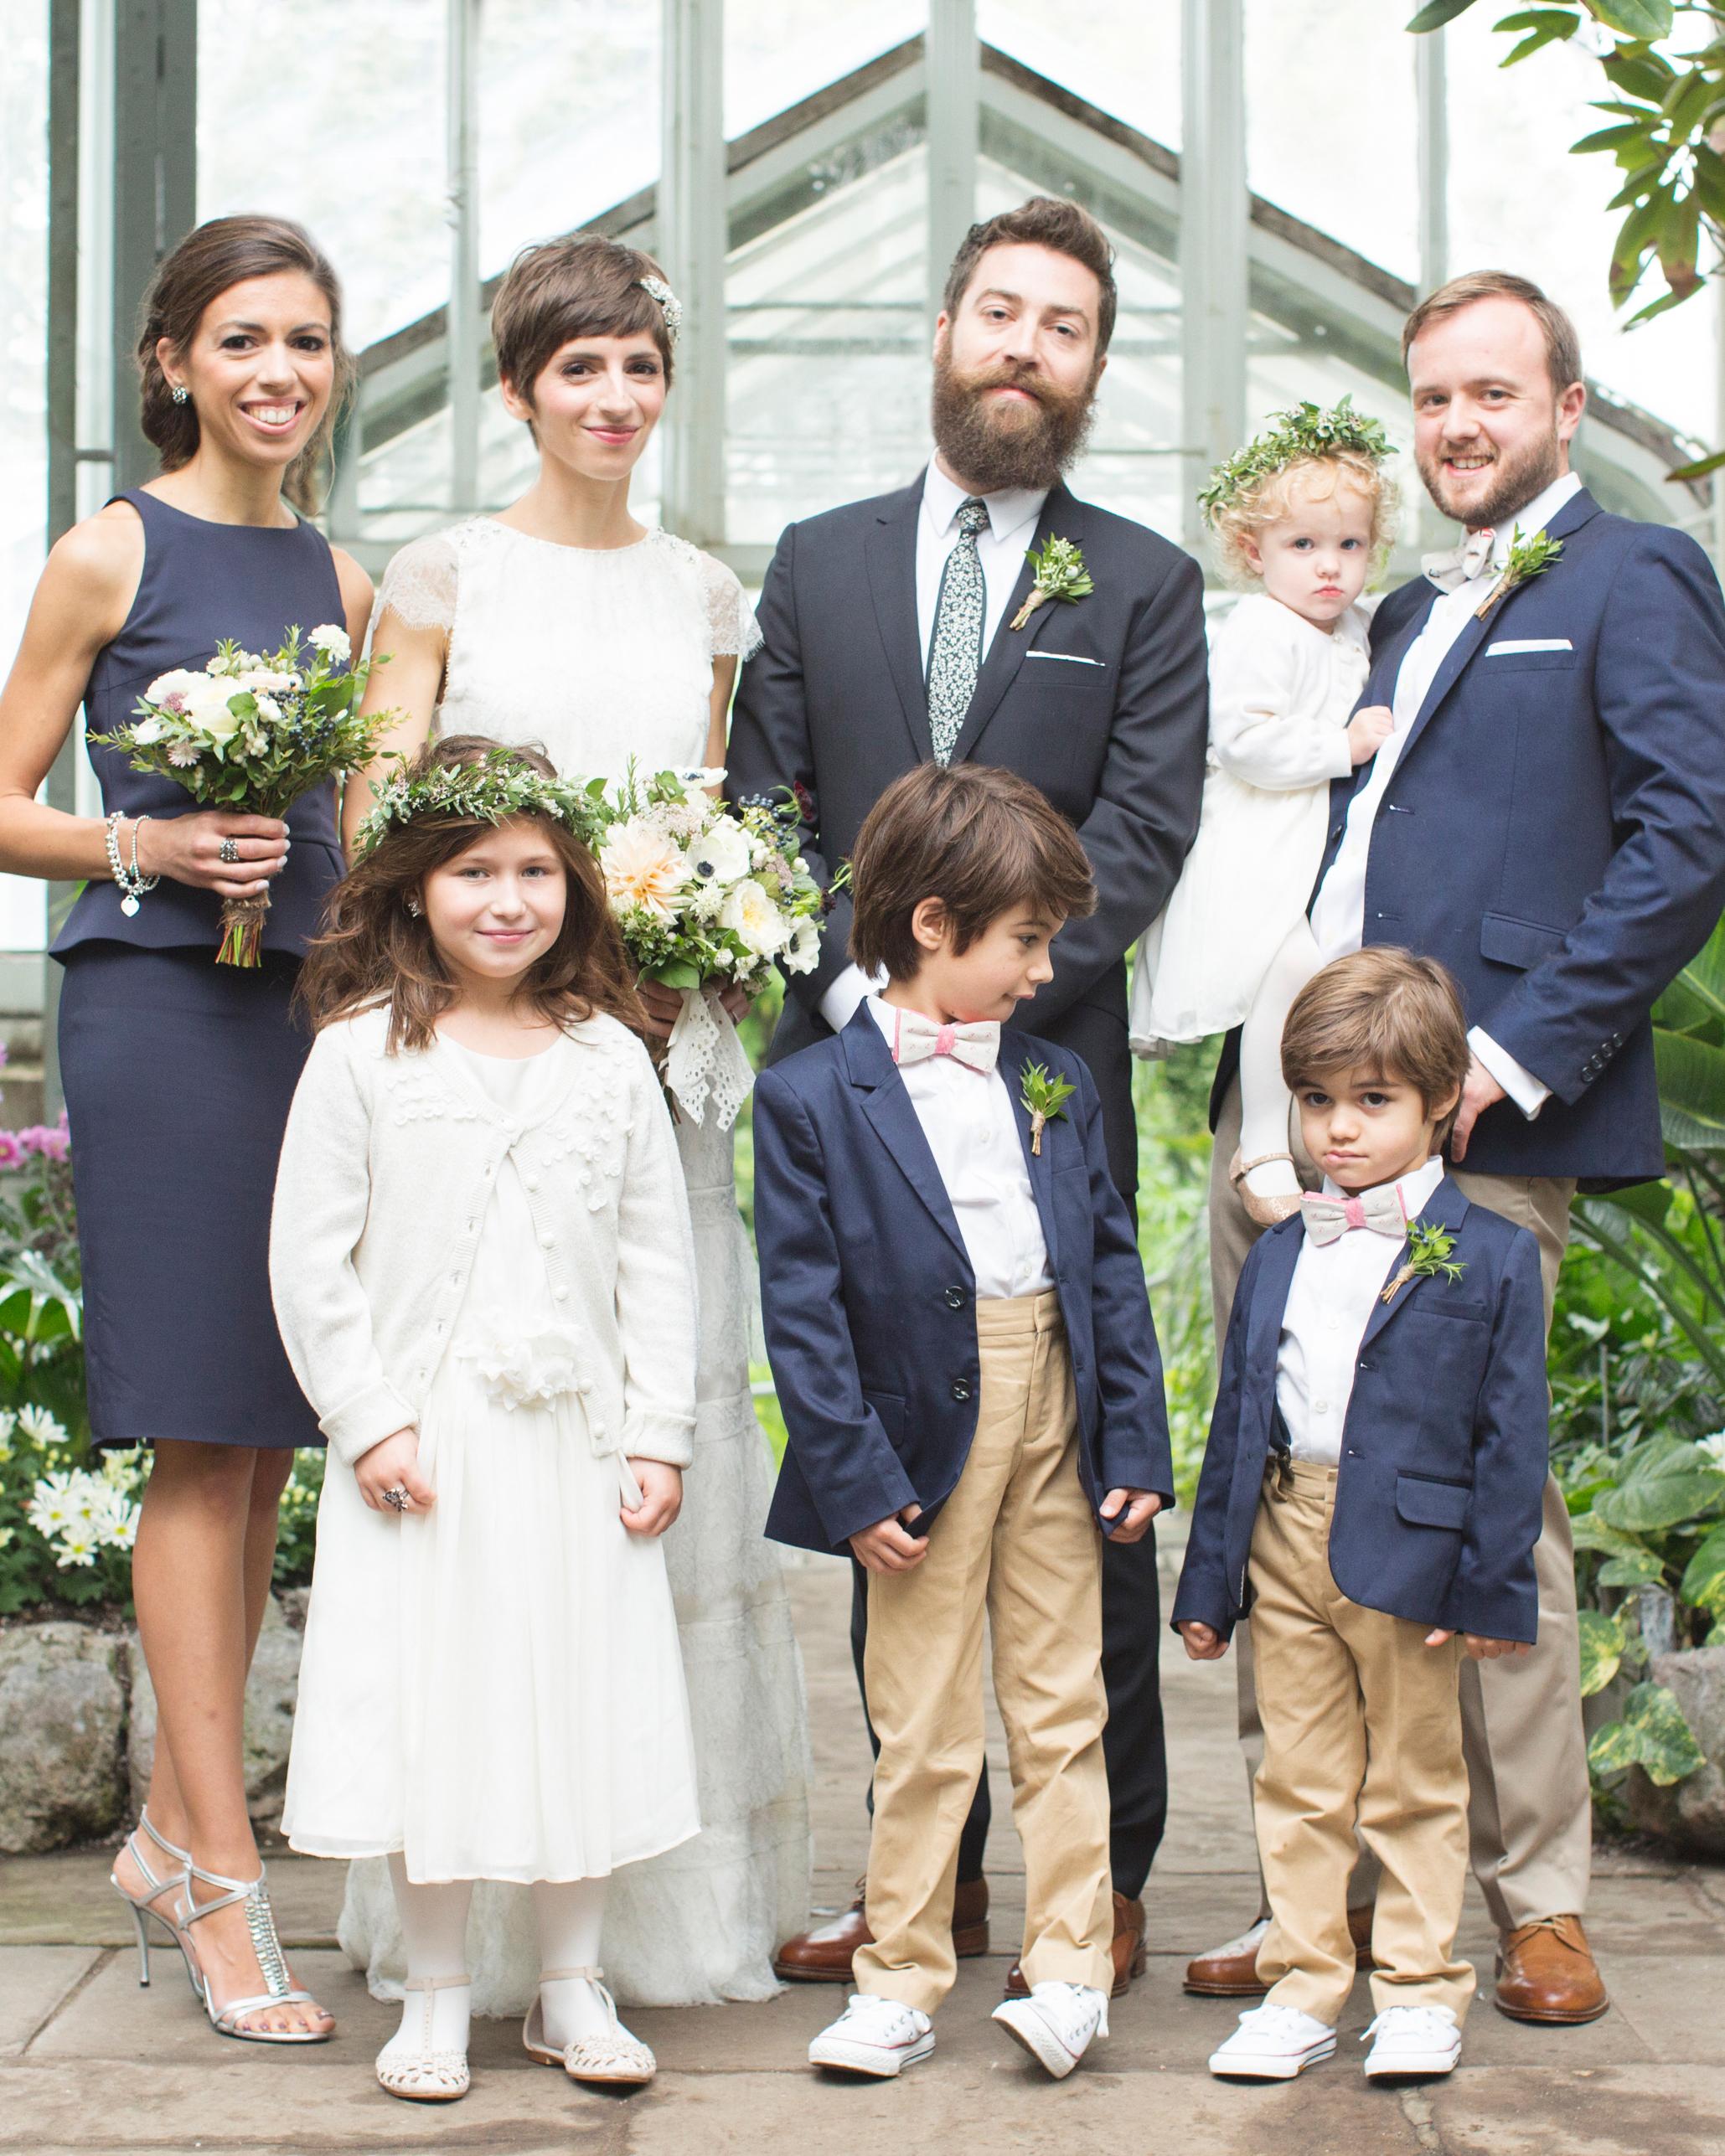 trish-alan-wedding-bridalparty-212-0714-s111348.jpg